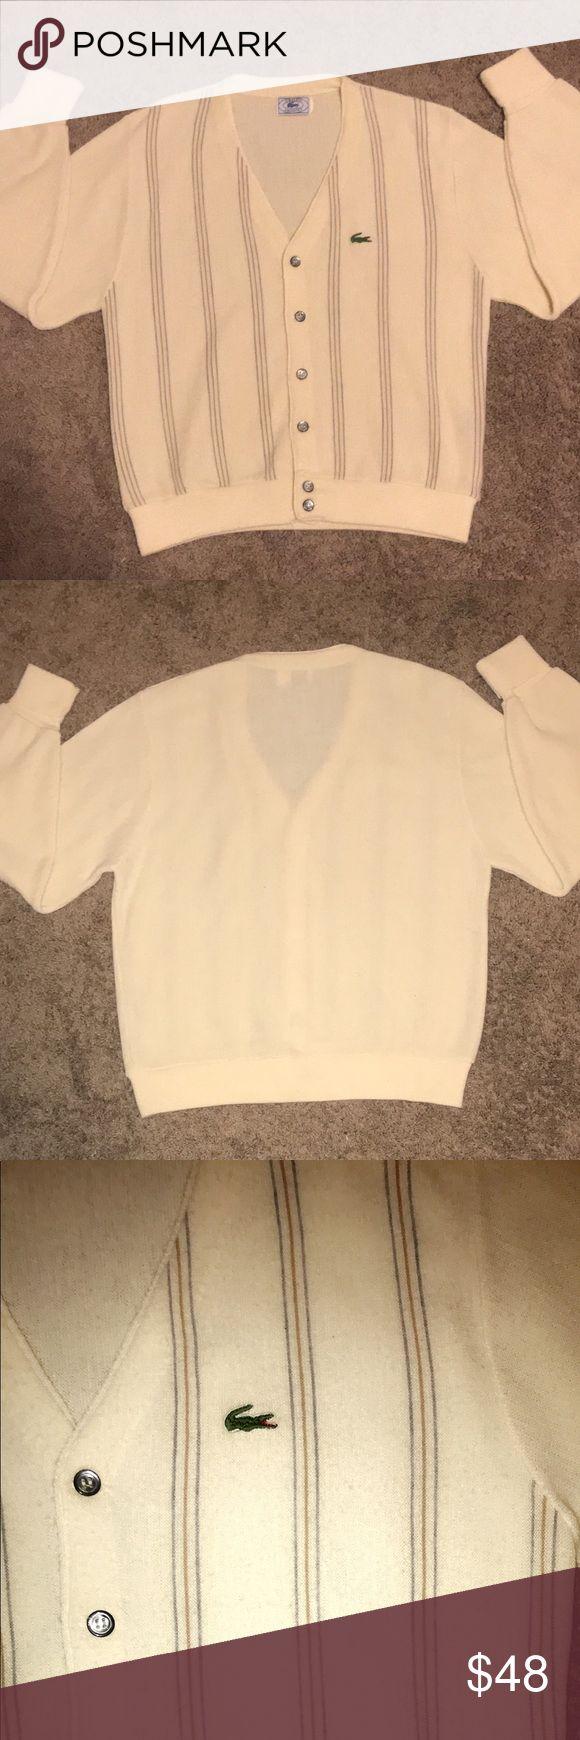 Men's Lacoste Cardigan Sweater Vintage IZOD x Lacoste cardigan sweater in excellent condition no flaws size Medium! (: Lacoste Sweaters Cardigan